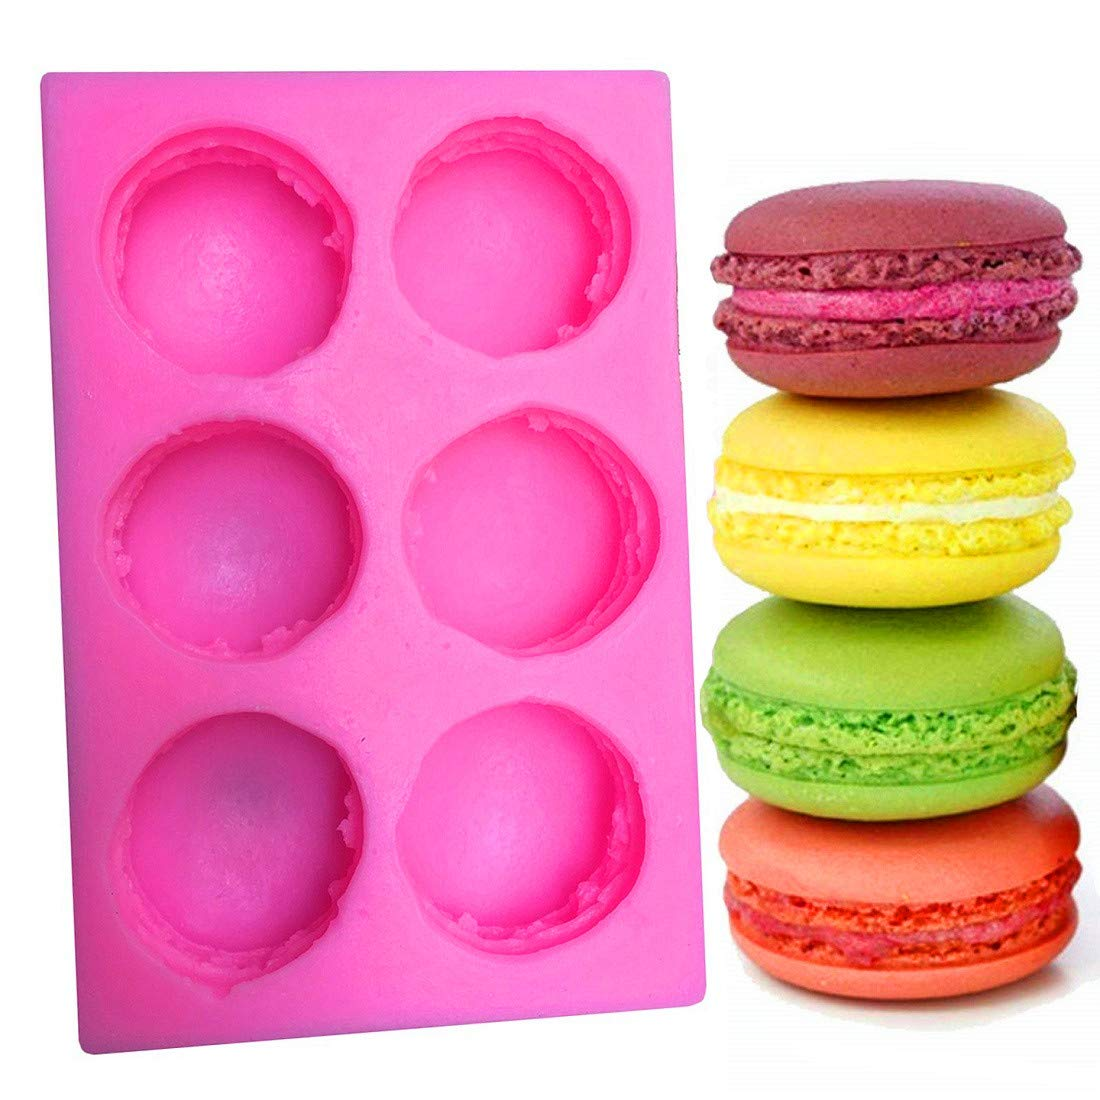 BUSOHA 3D Macaroon Silicone Mold for Fondant, Macaron Hamburger Baking Molds, Candle Mold, Muffin Molds, Cake/Cupcake Decorating, Chocolate, Candy, Polymer Clay, Mini Soap, Bath Bomb …